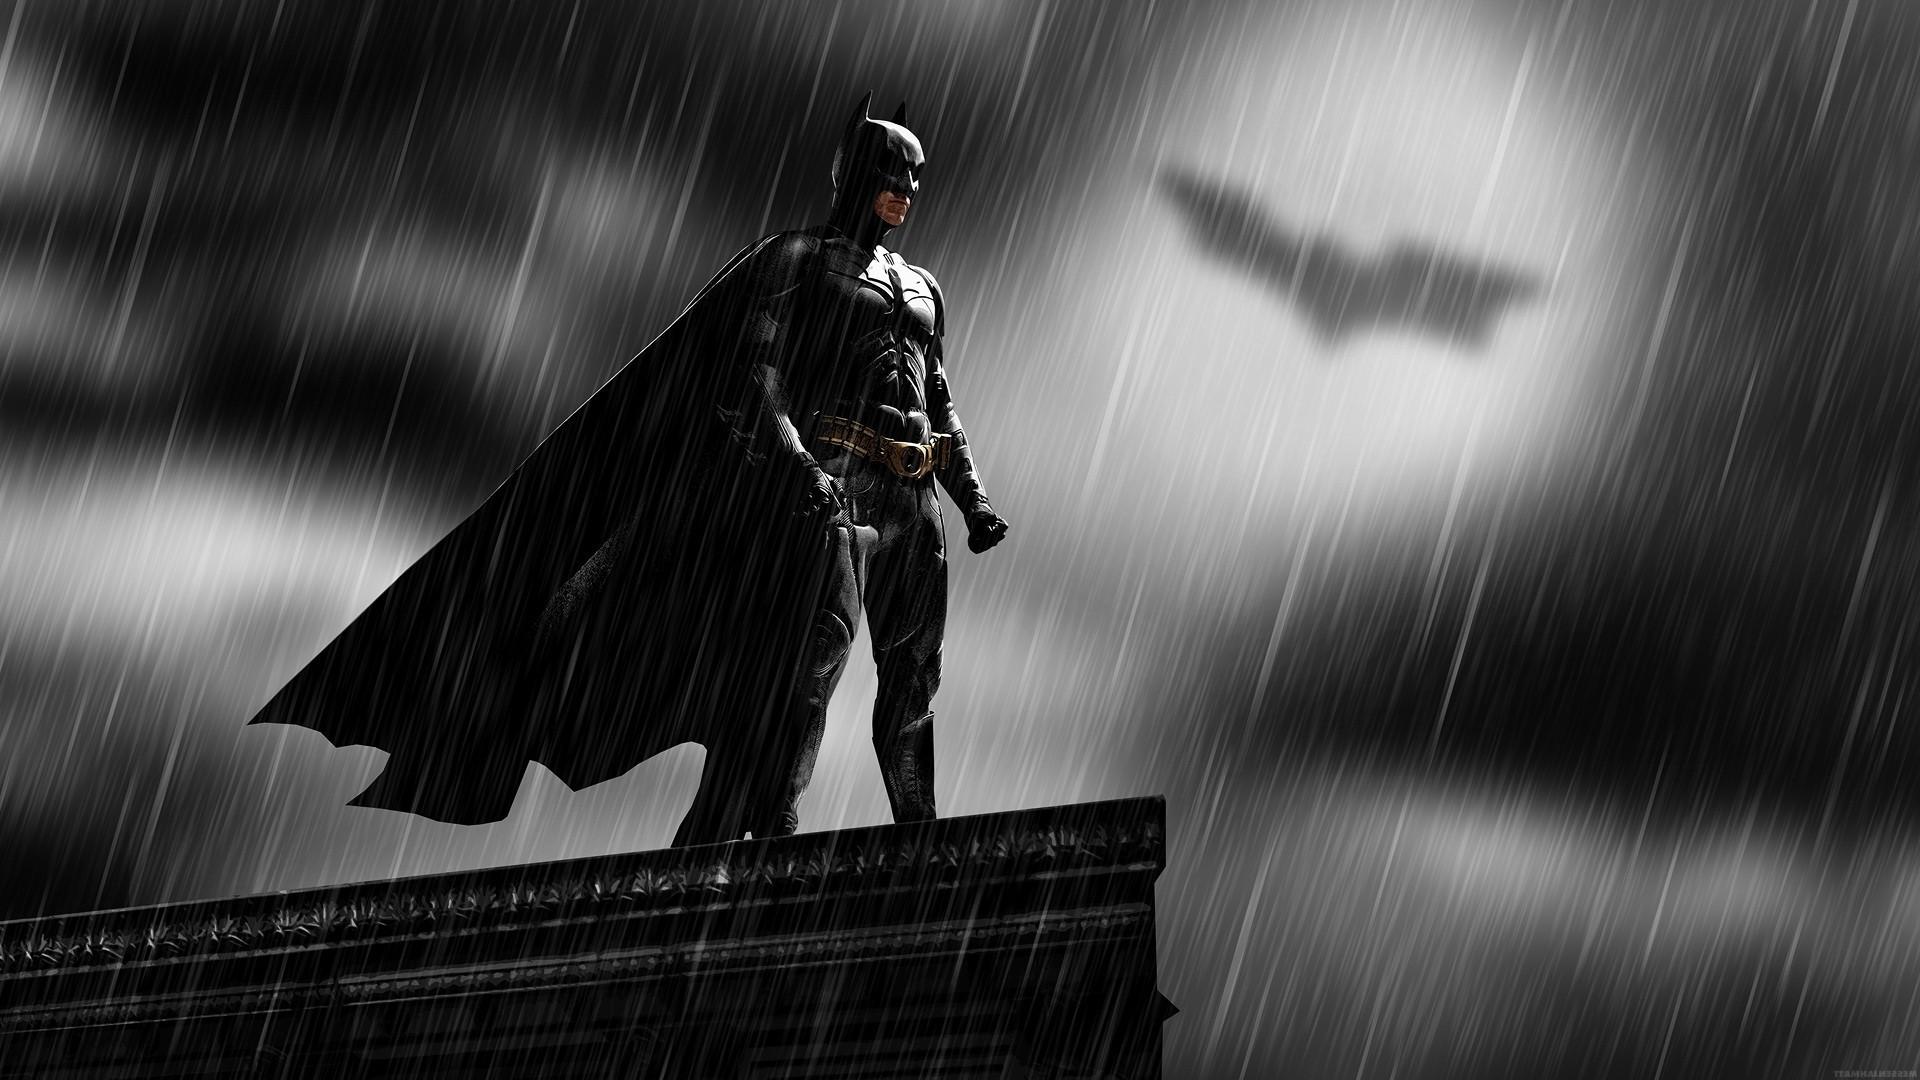 Batman, Rooftops, Rain, Bat Signal, MessenjahMatt, People Wallpapers HD /  Desktop and Mobile Backgrounds